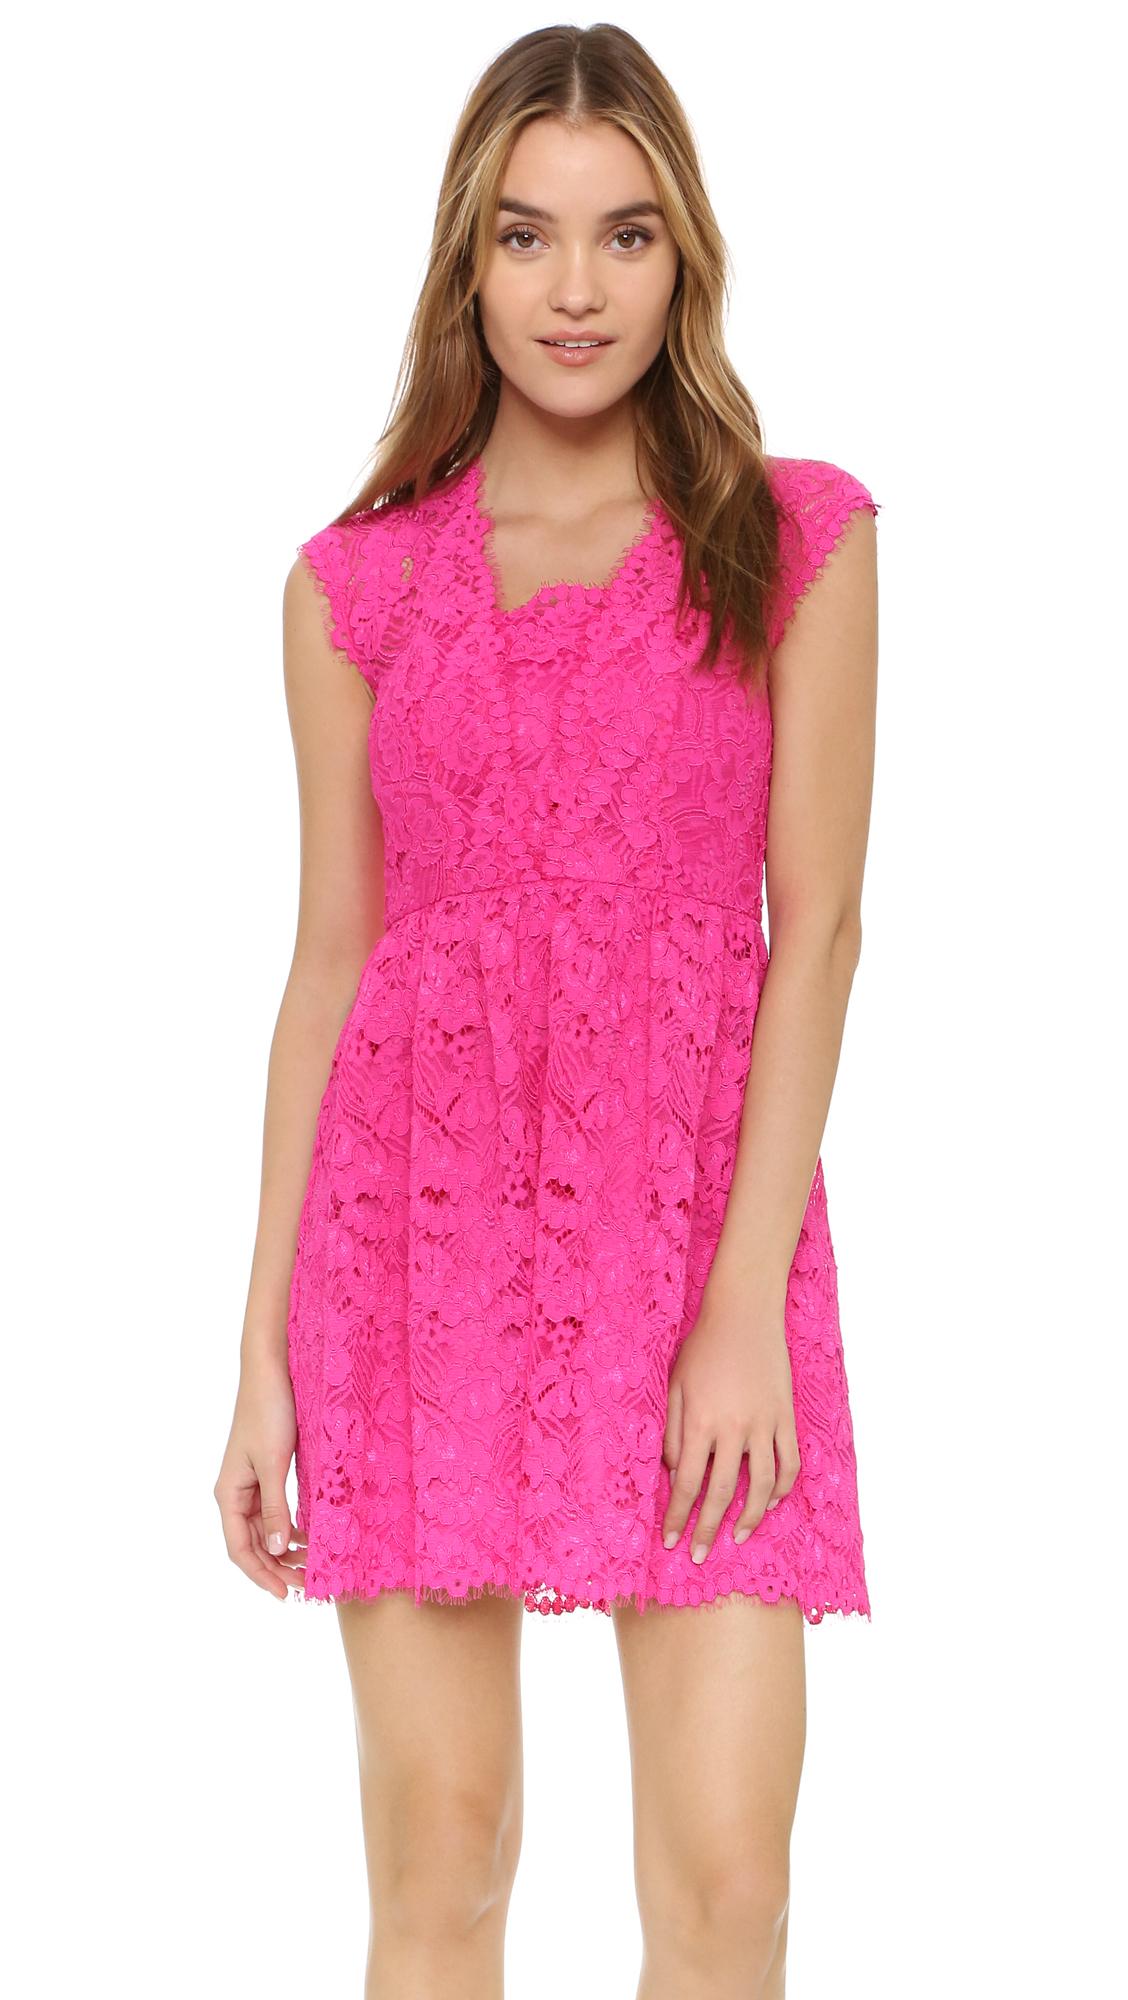 Shoshanna Vani Lace Dress in Pink   Lyst